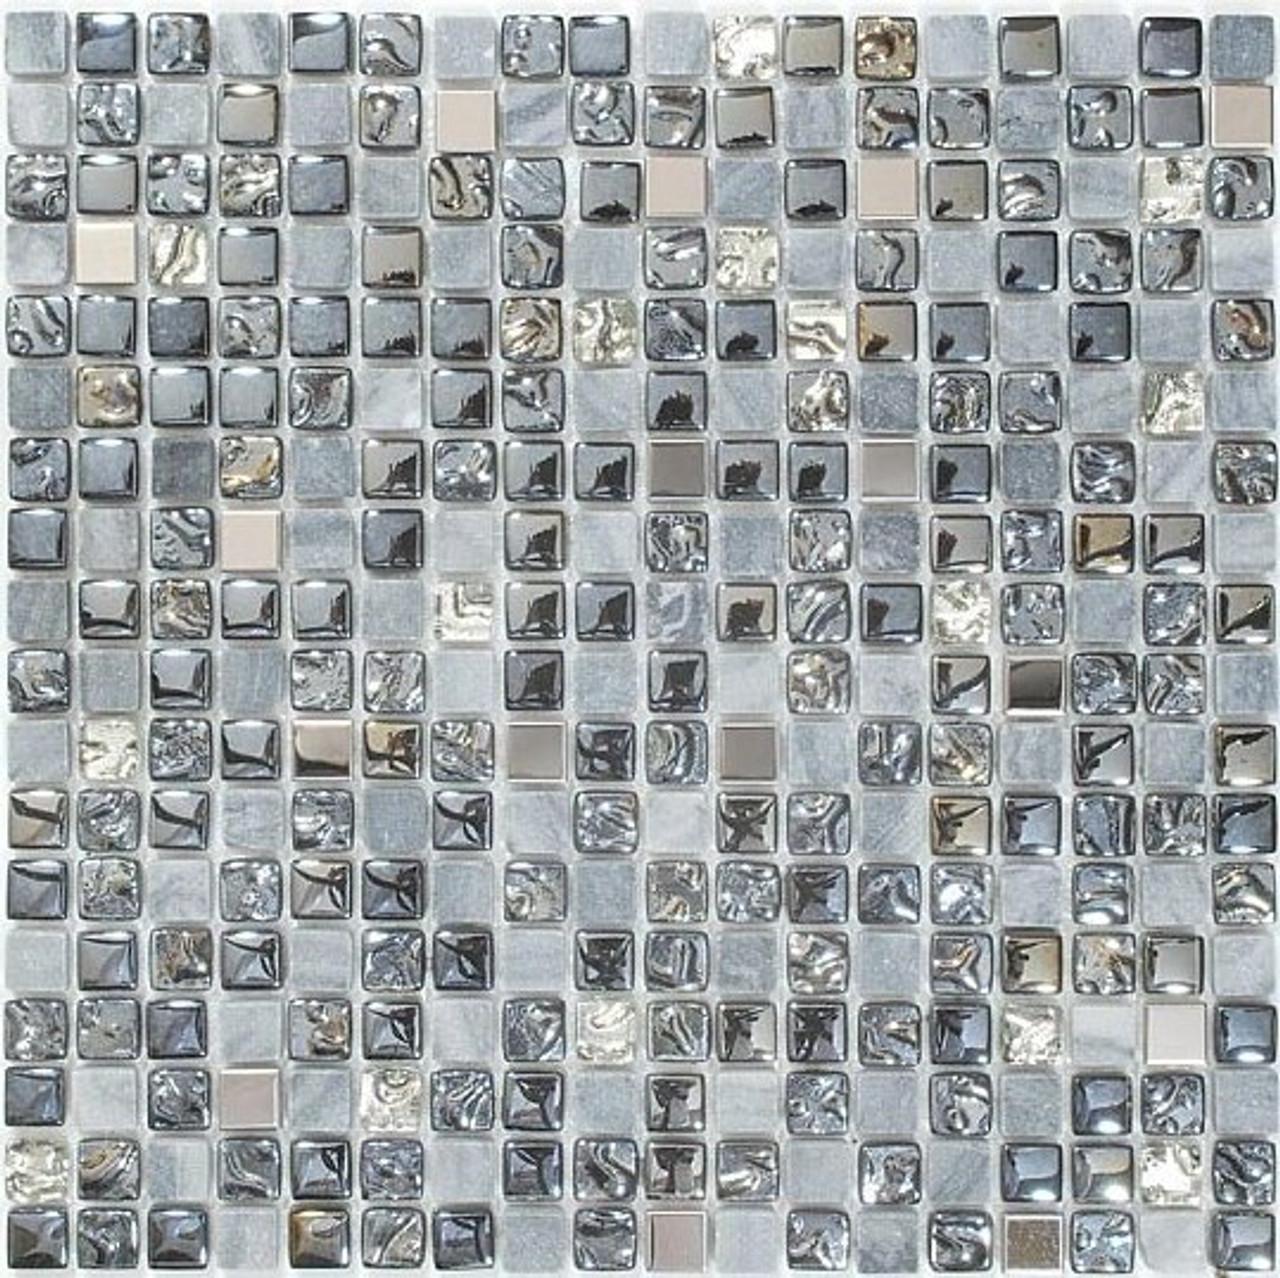 Bella Glass Tiles Opulence 5/8 x 5/8 Mosaic Series Starry Night